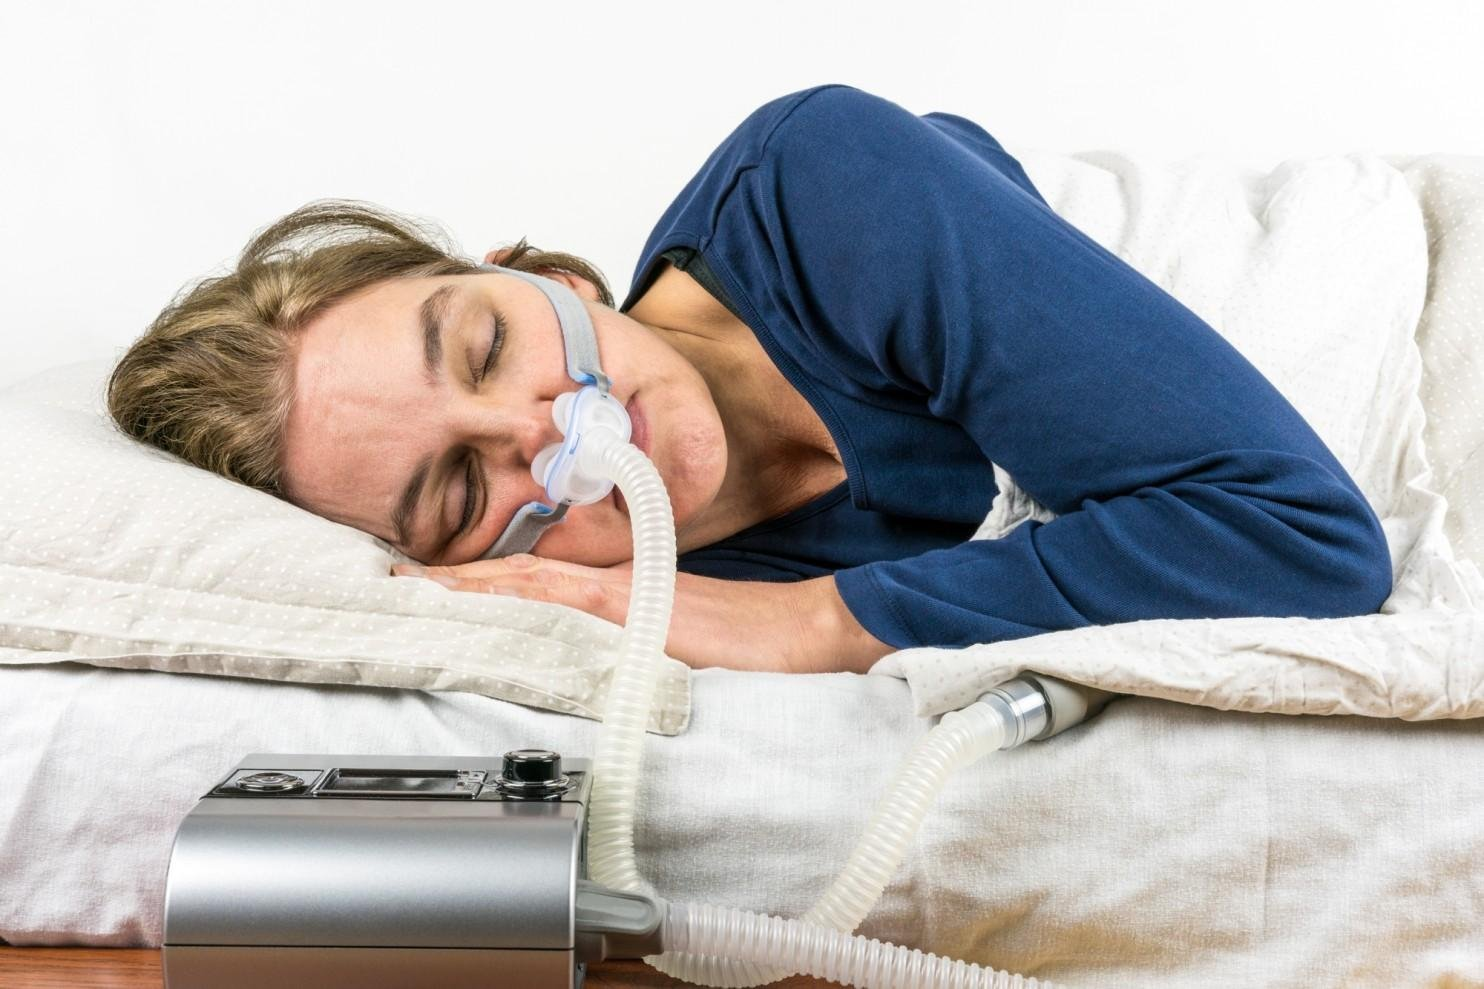 Untreated Sleep Apnea May Worsen Markers Of Heart Health And Diabetes